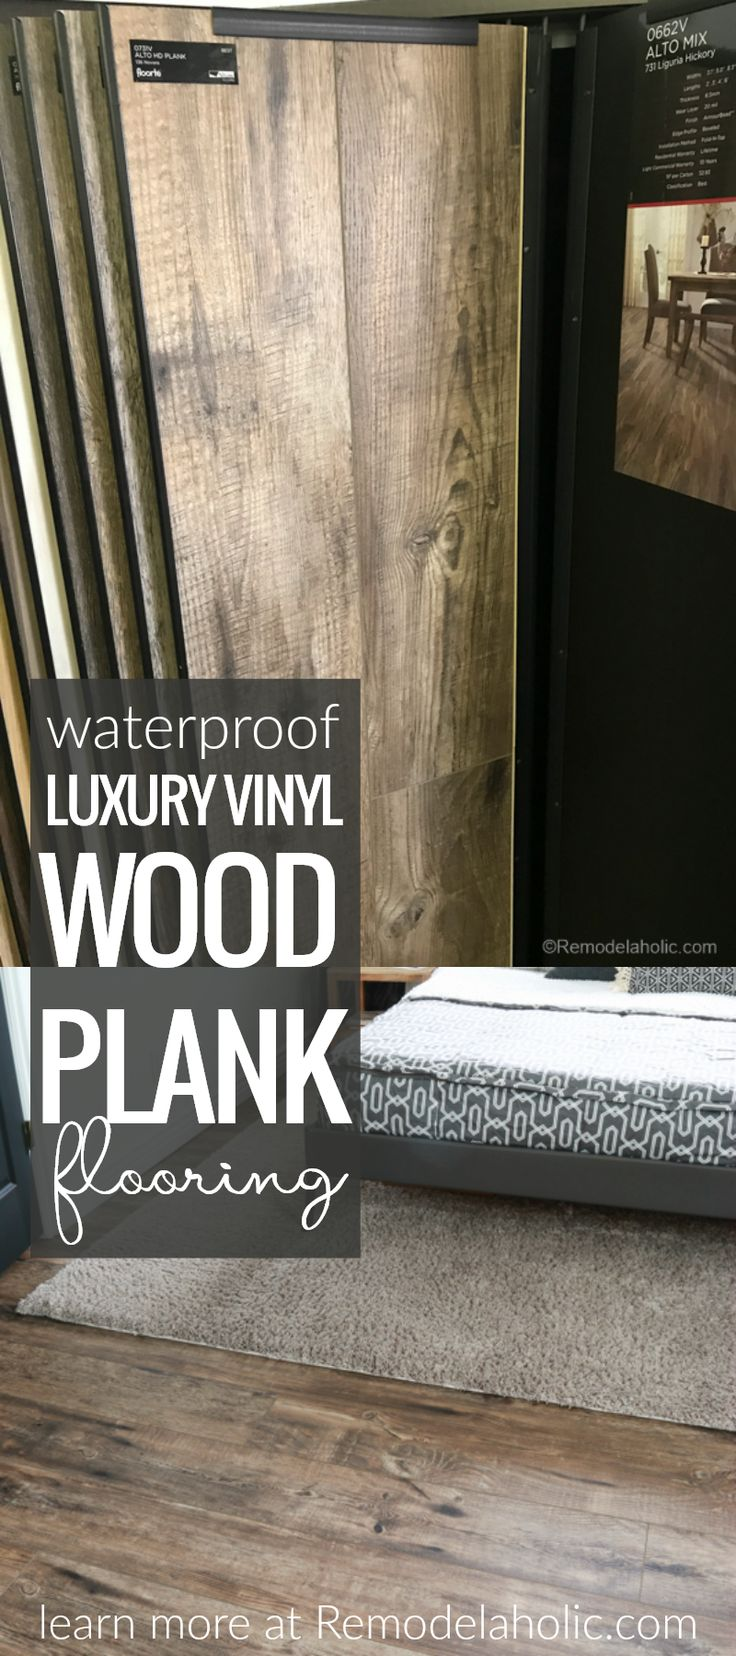 Get the farmhouse look without the upkeep of hardwood floors! Waterproof Luxury Vinyl Wood Plank Flooring @Remodelaholic